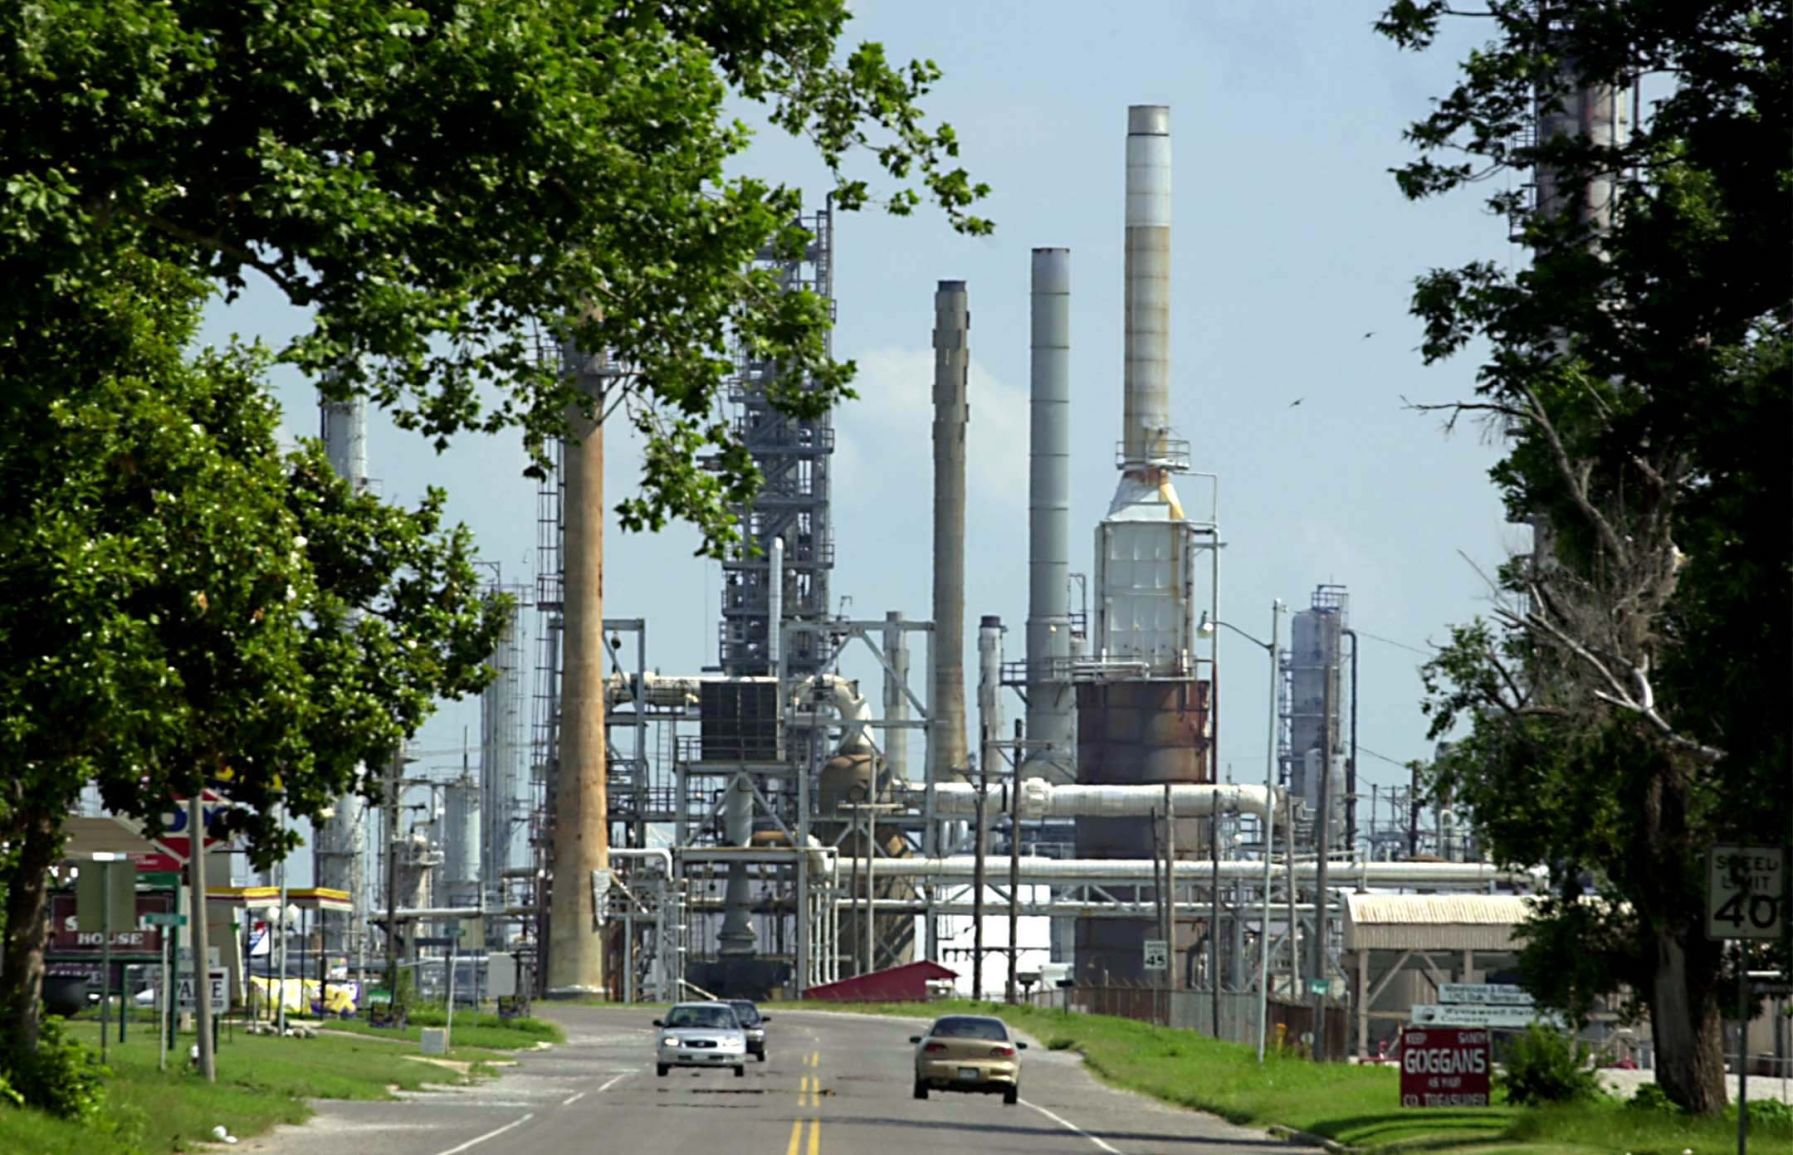 Wynnewood refinery jobs